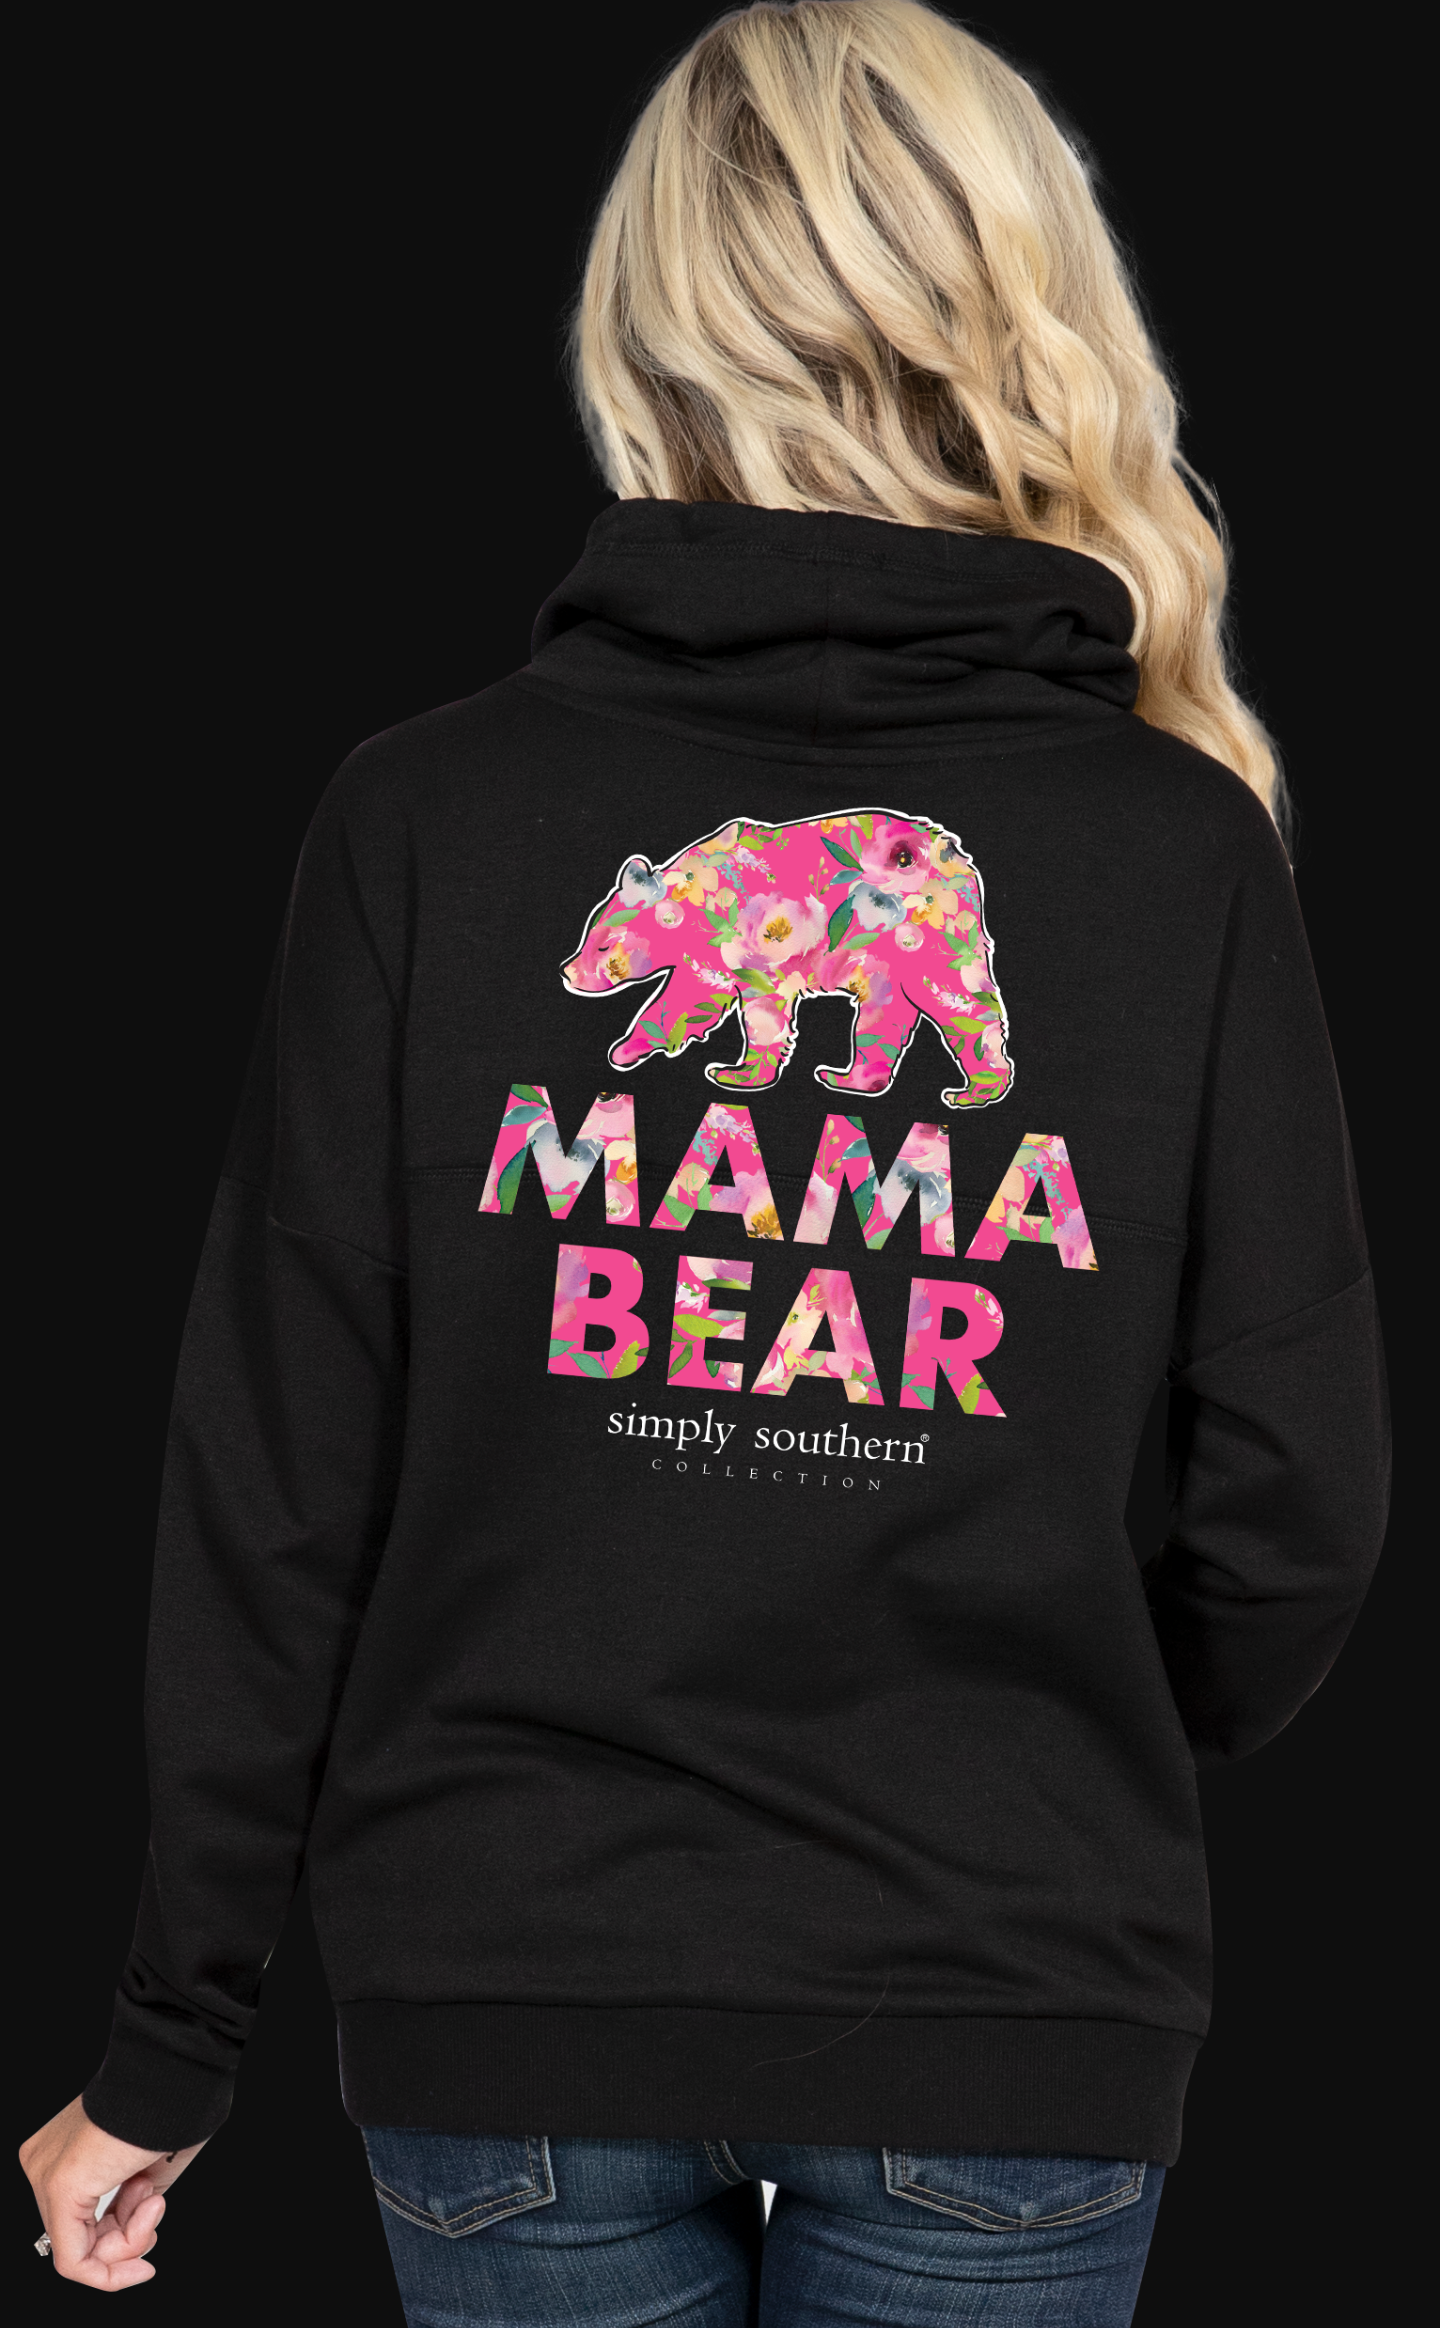 b1d4dbbfdc5 Simply Southern Mama Bear Cowl Neck Sweatshirt